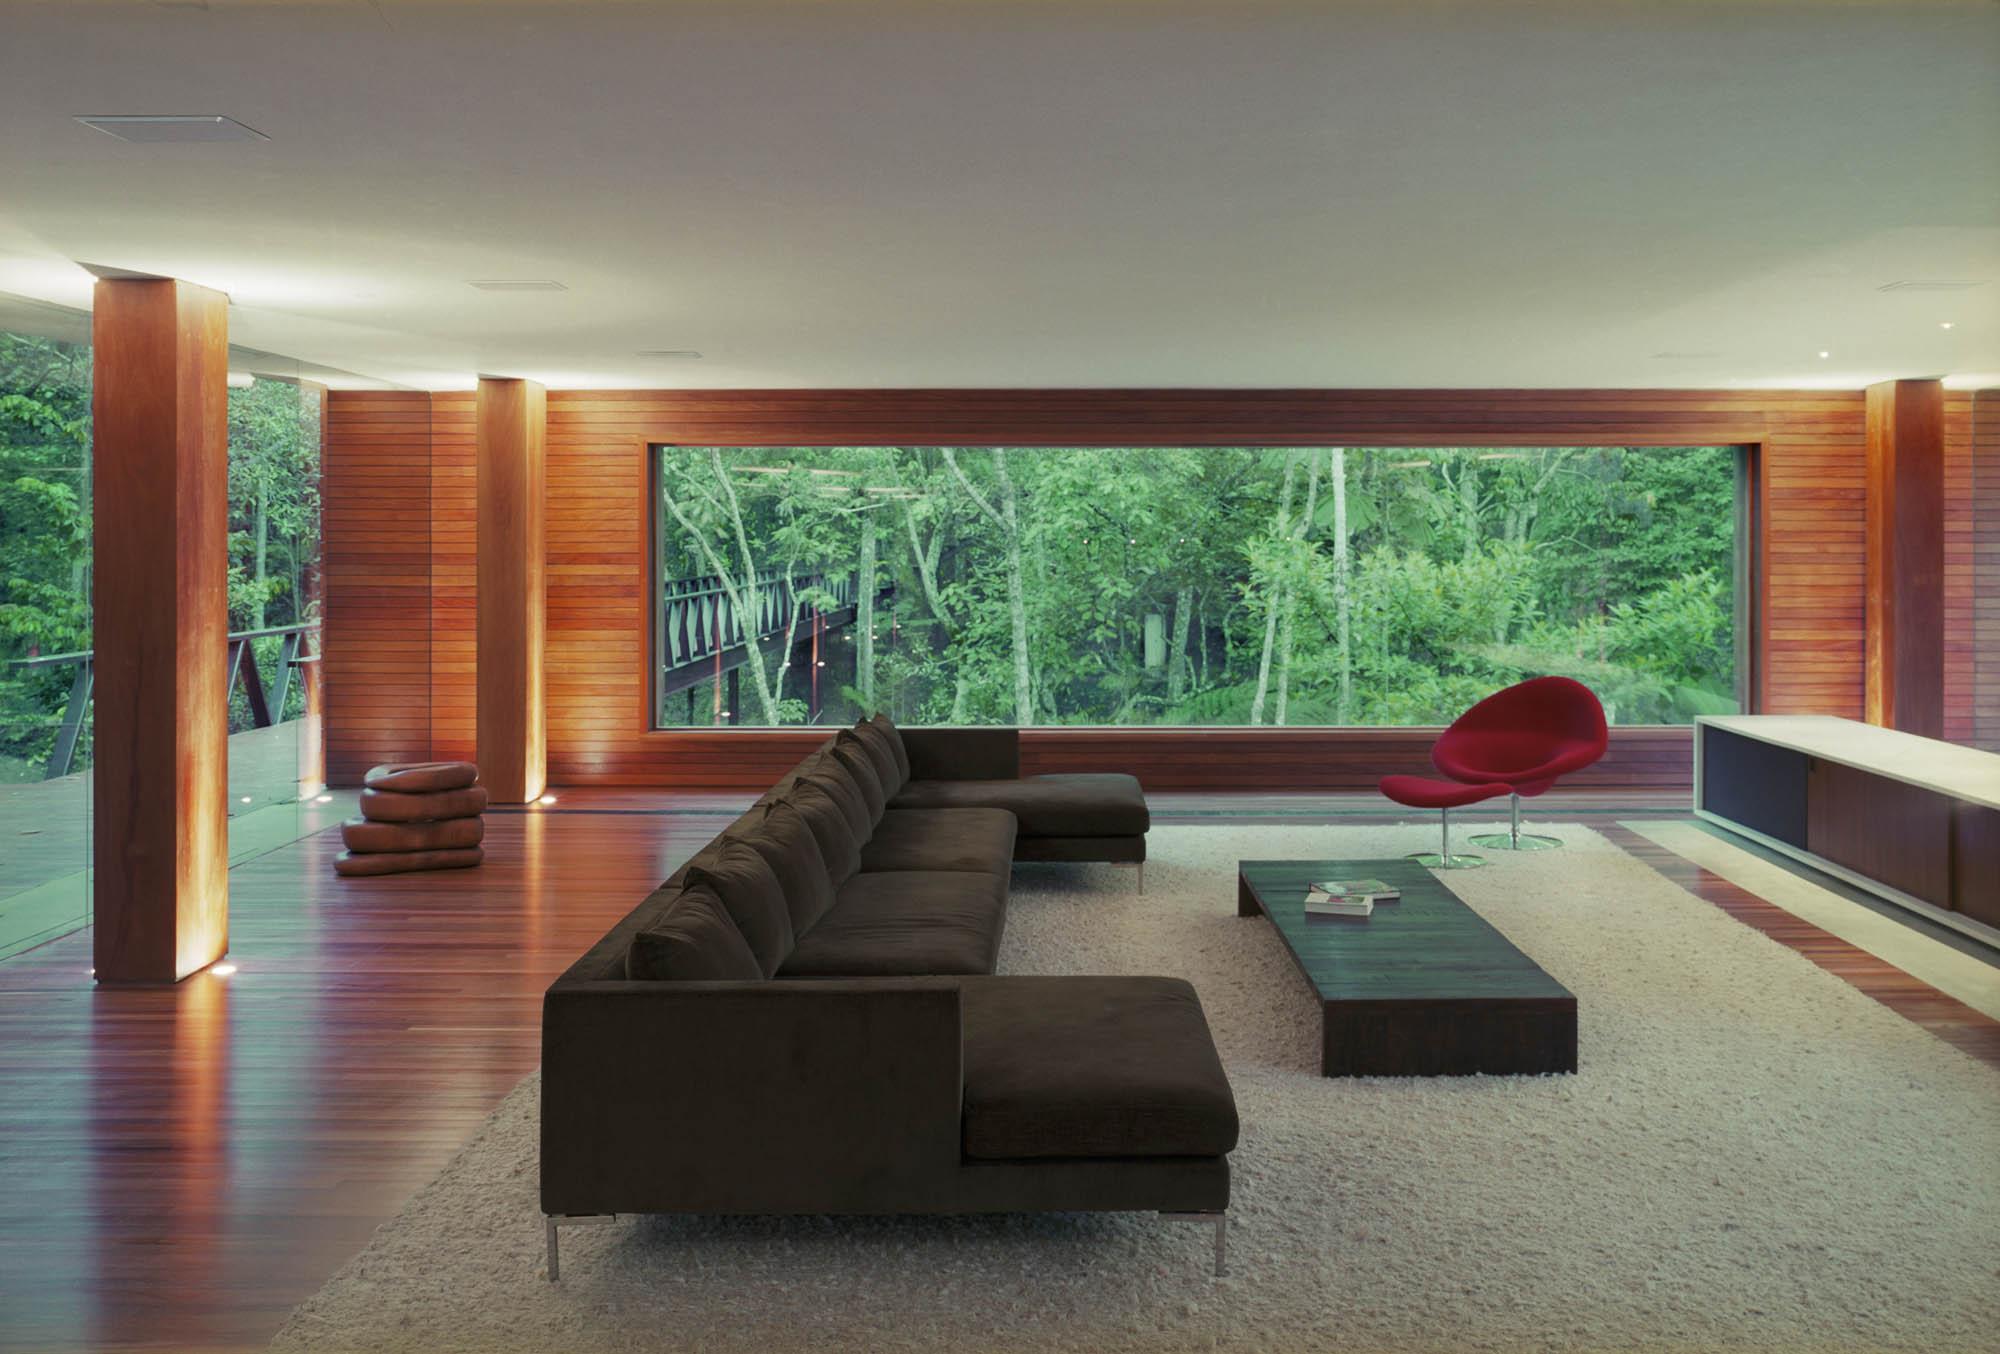 Br house by marcio kogan karmatrendz for Home architecture analogy